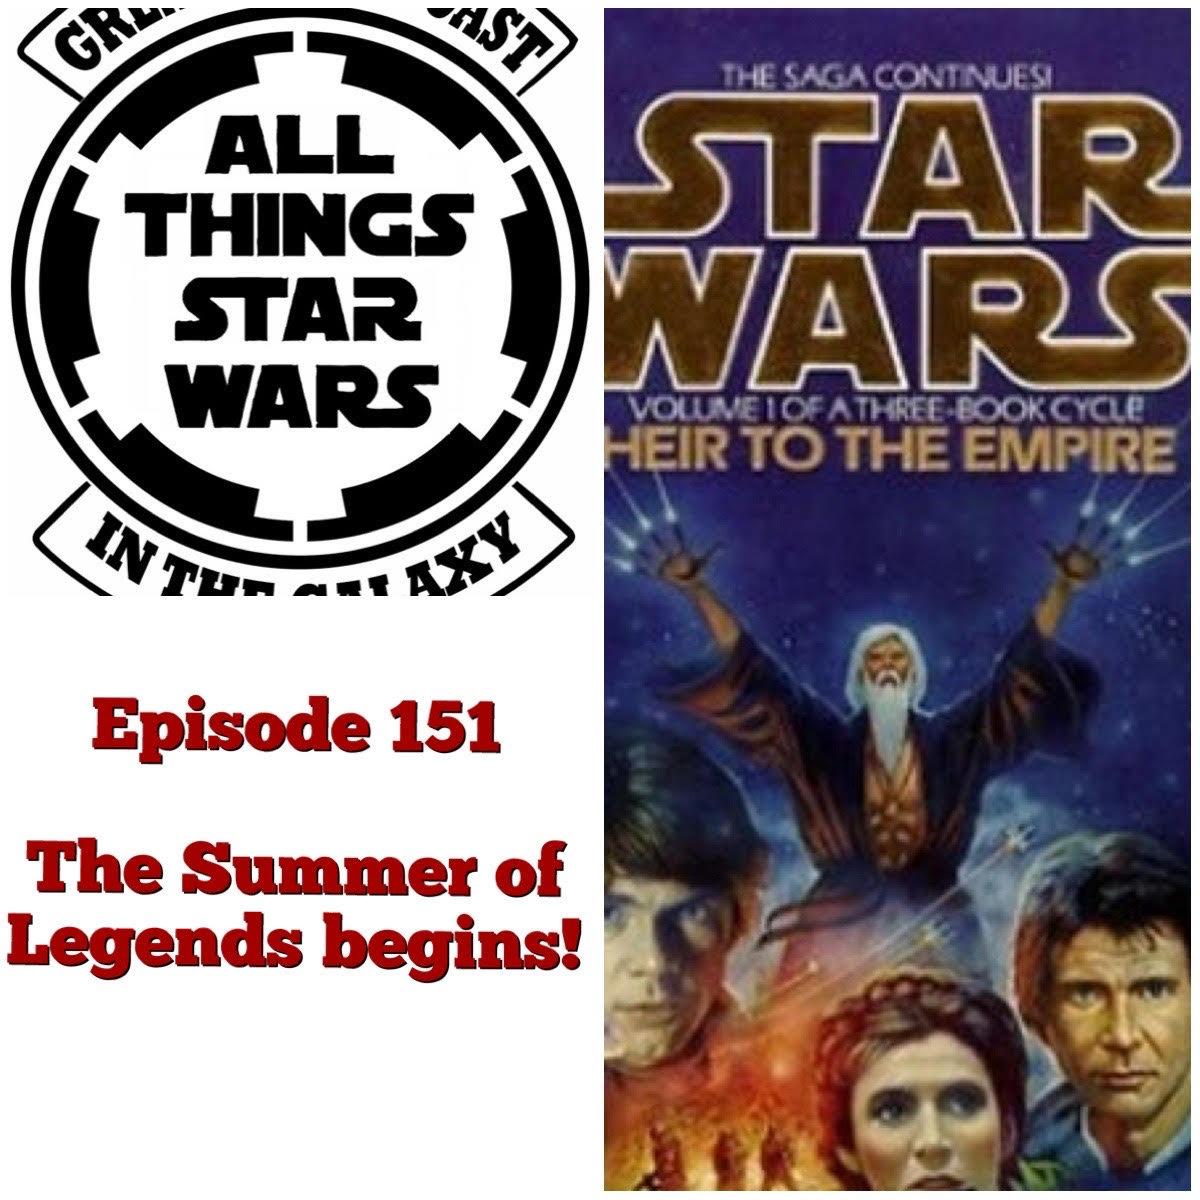 Episode 151 - Heir to the Empire